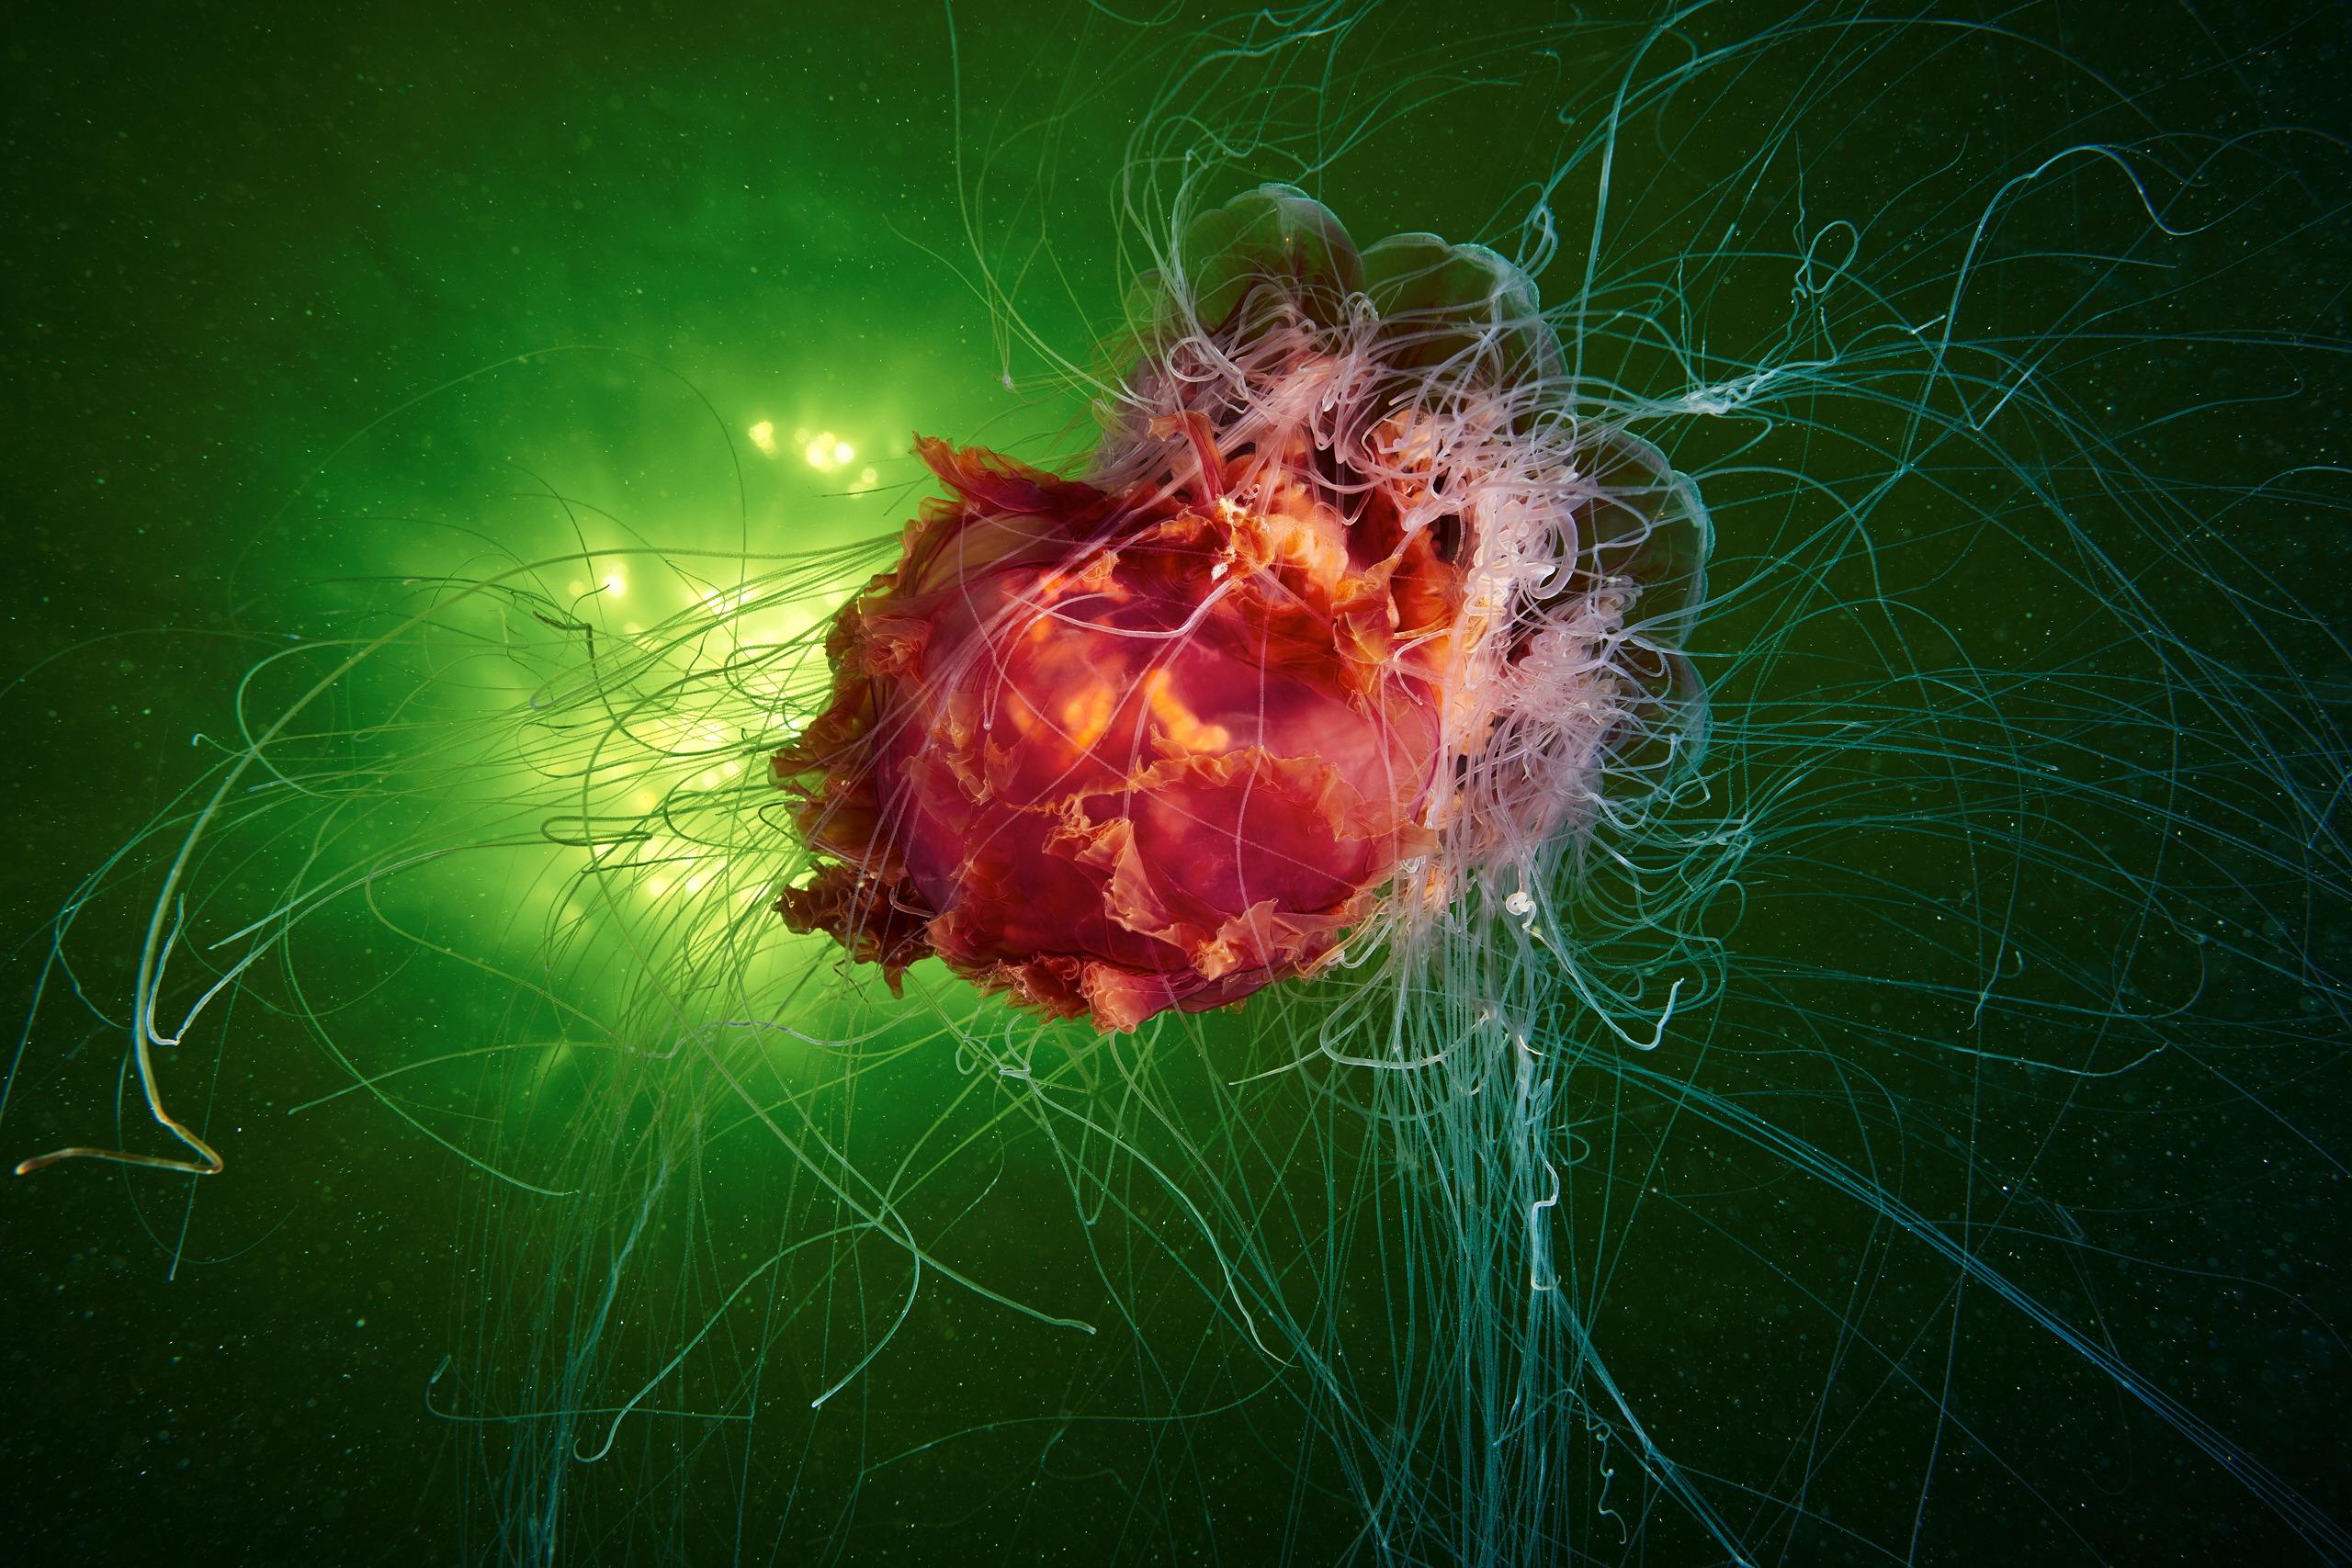 Scyphozoan jellyfish – Lion's mane jellyfish – Cyanea capillata 1